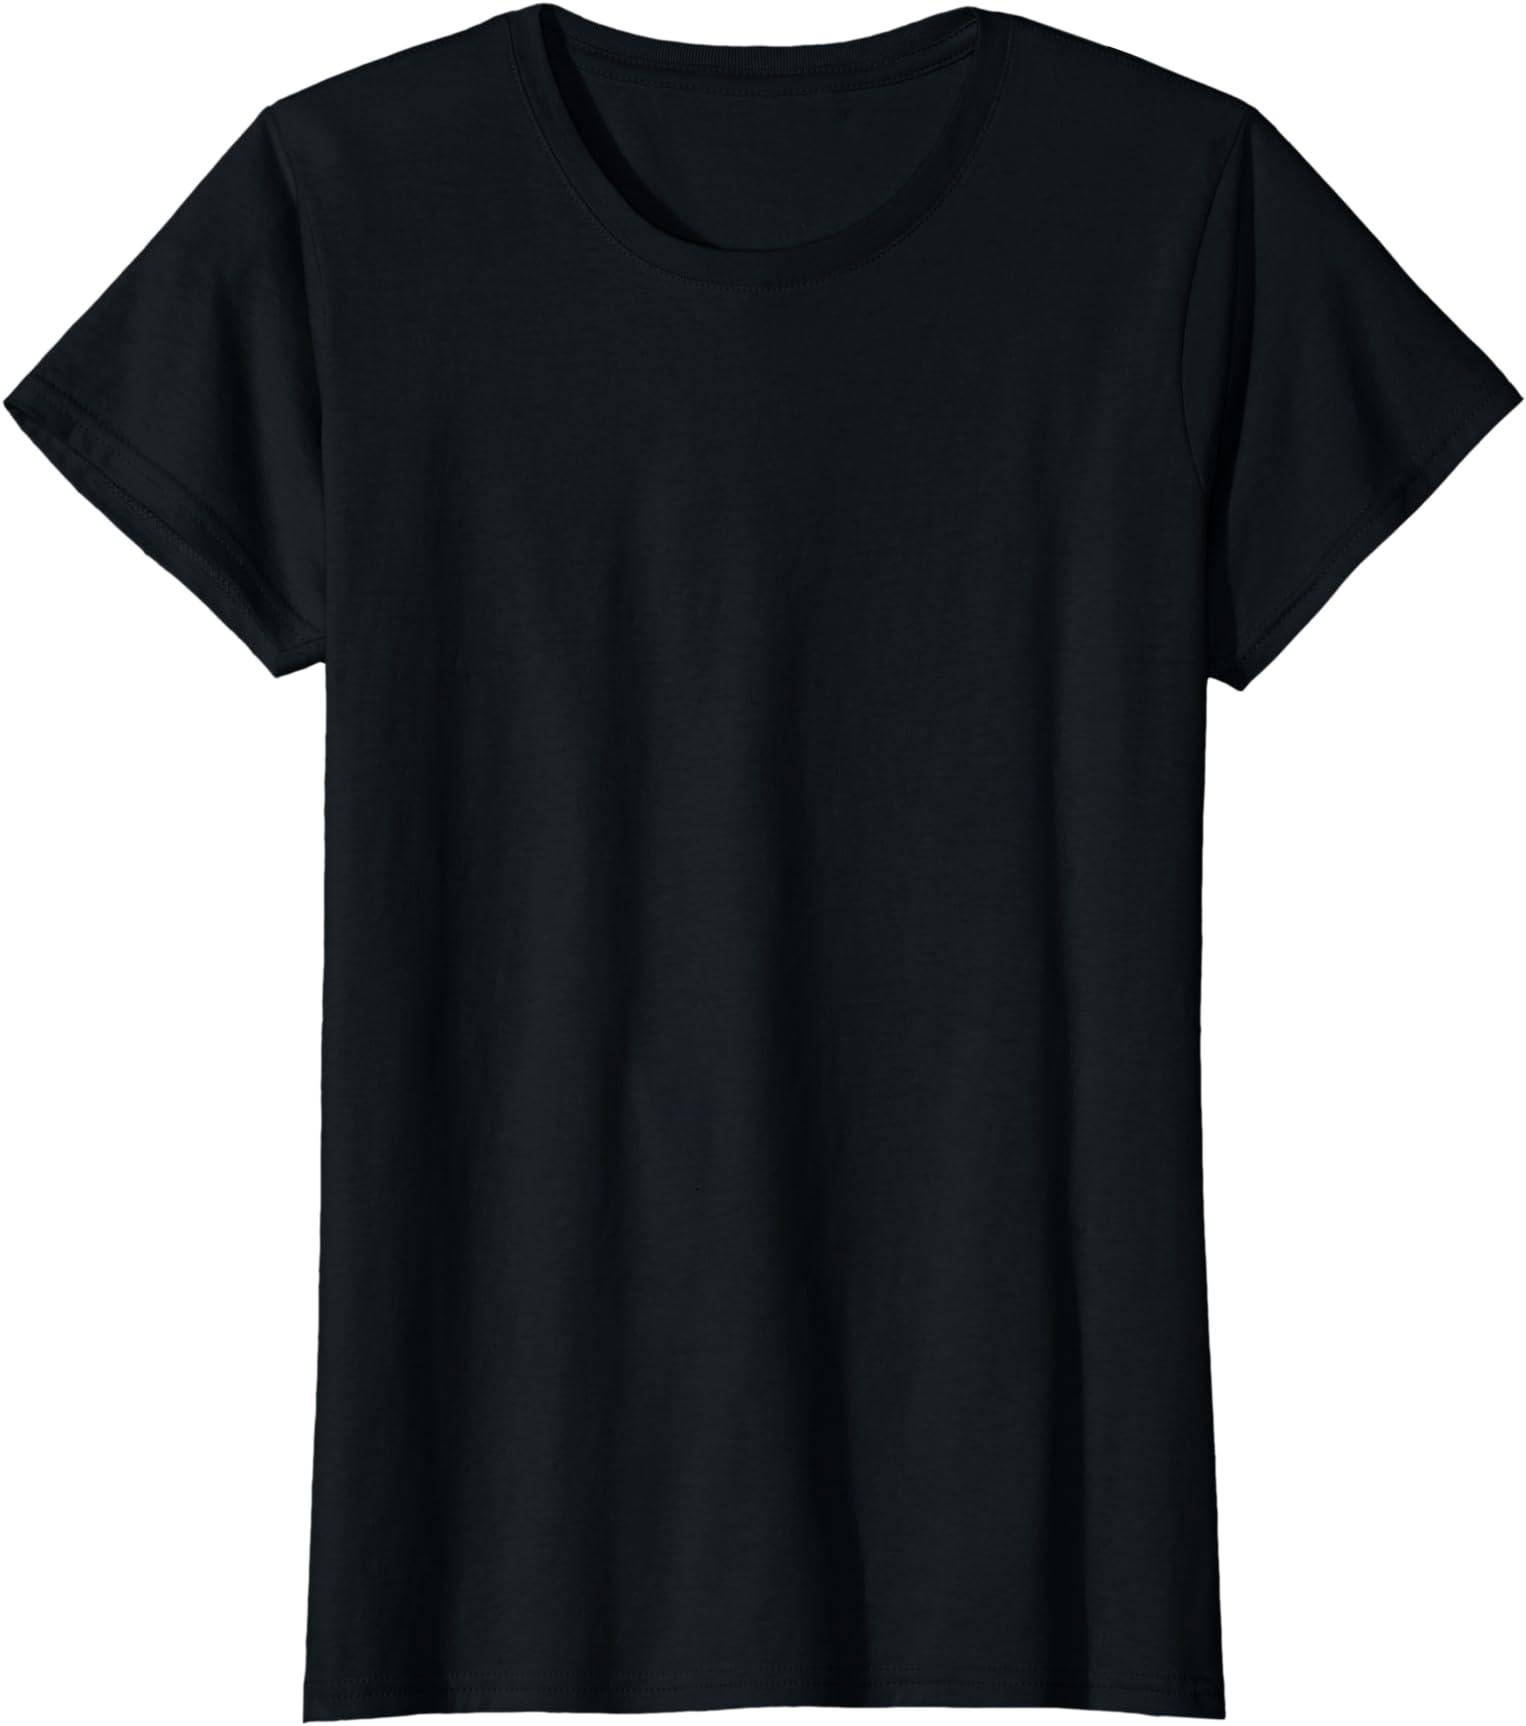 Route 666 Classic Biker T shirt men/'s cotton tshirt Six Six Six